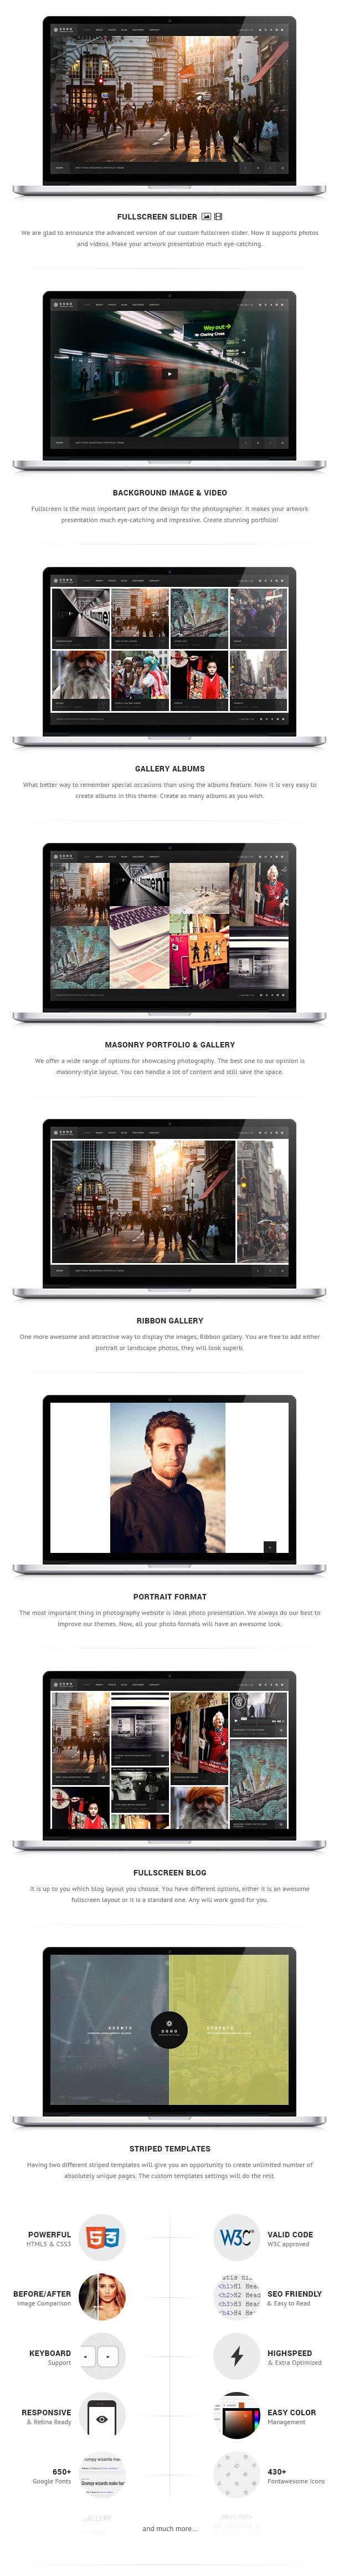 Soho - Fullscreen Photo & Video Web Template - 2